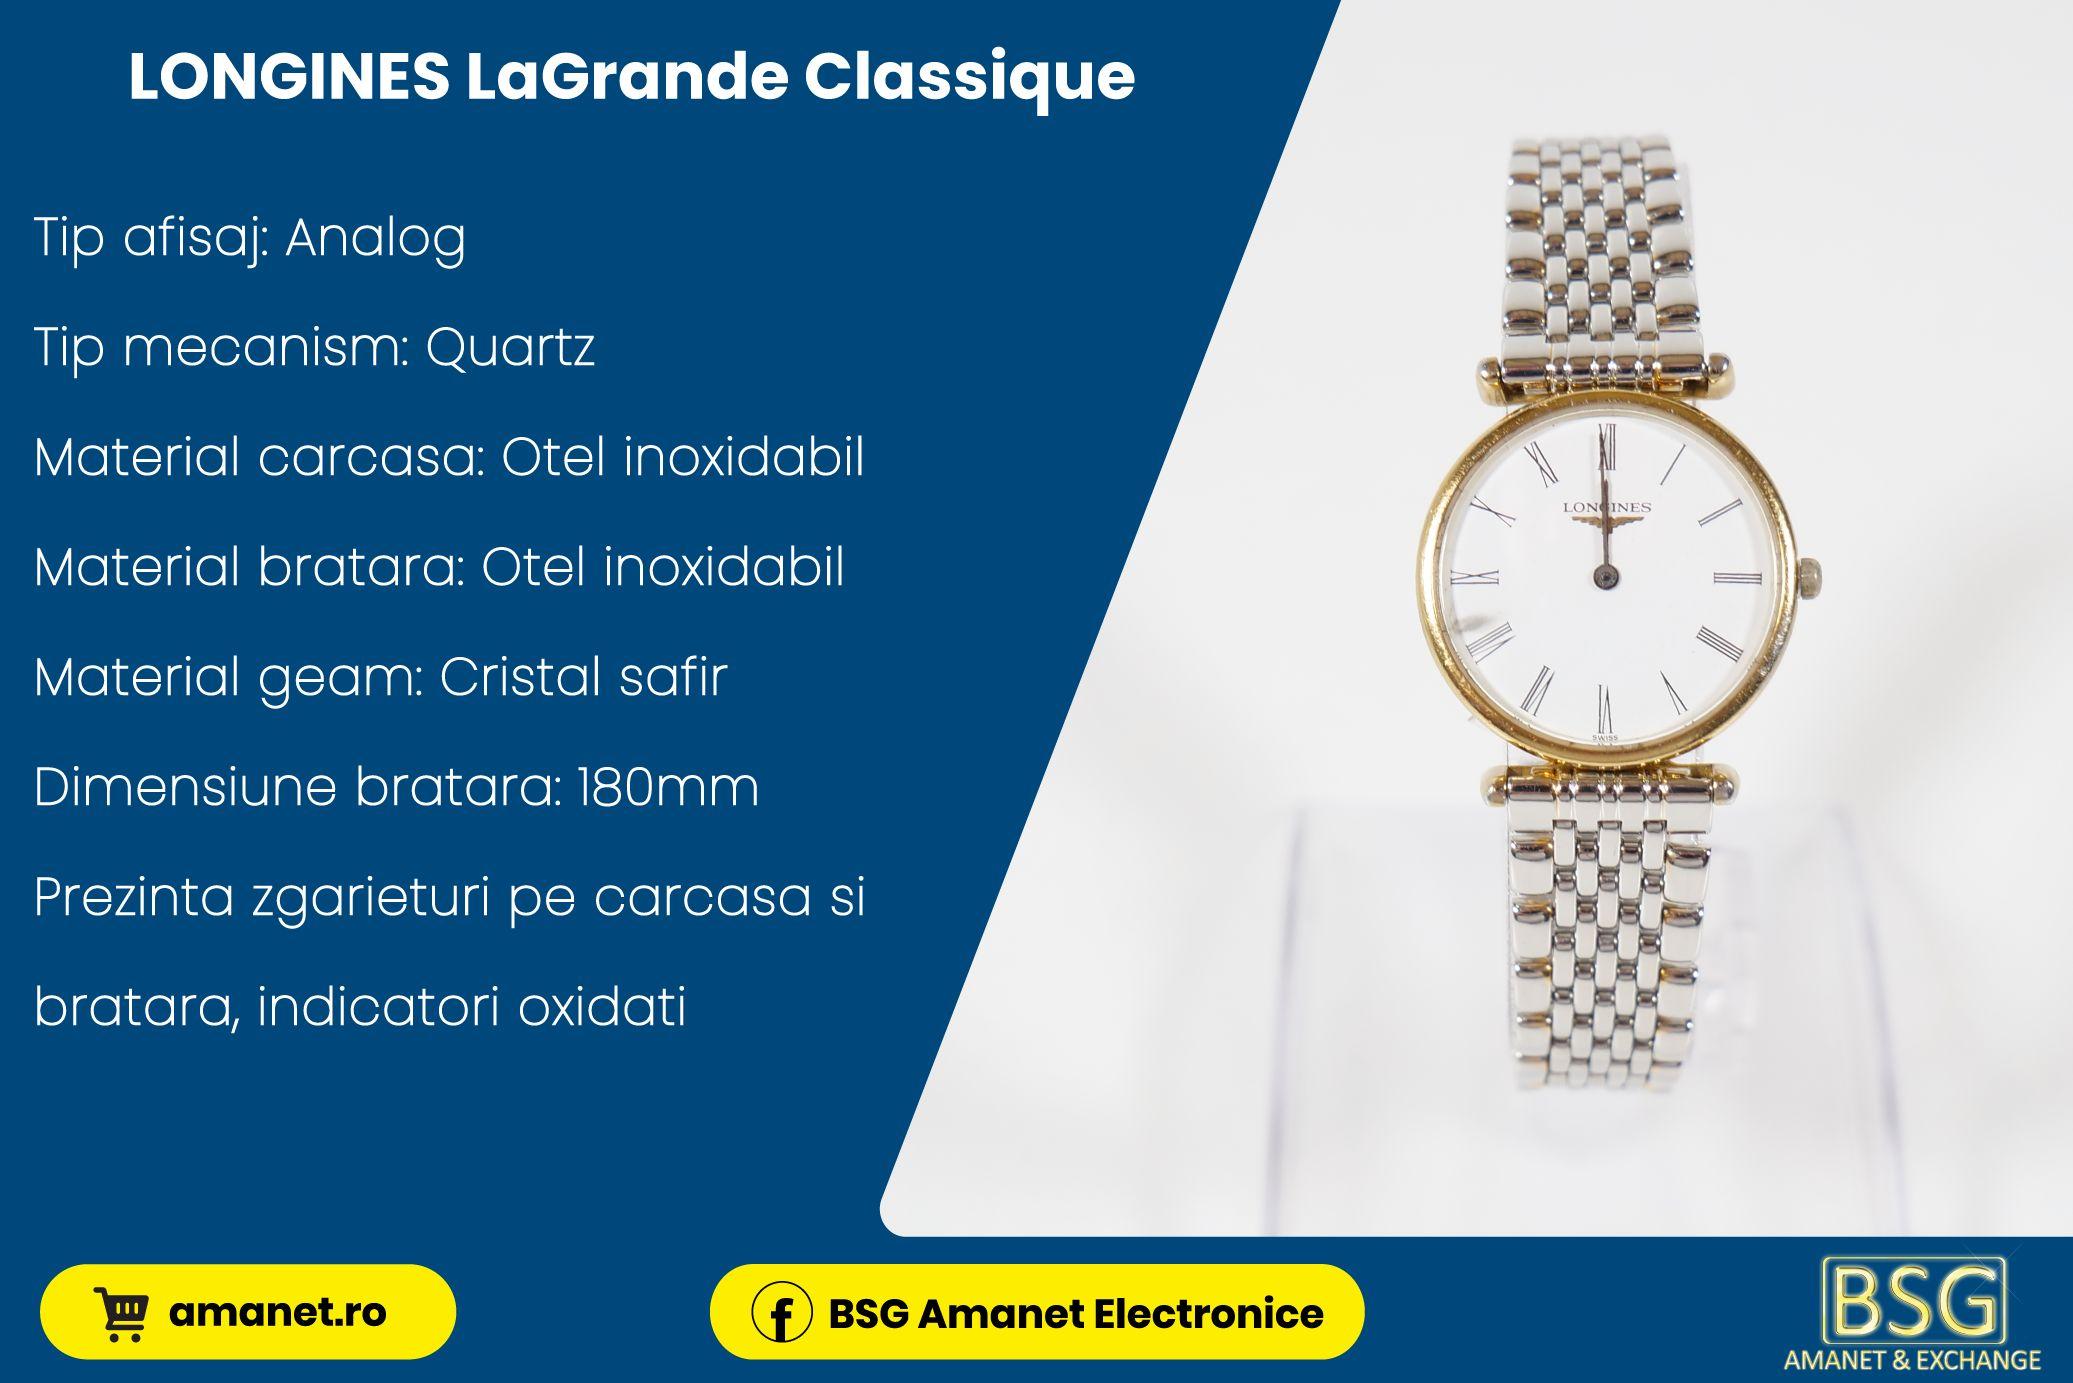 Ceas Longines LaGrande Classique - BSG Amanet & Exchange